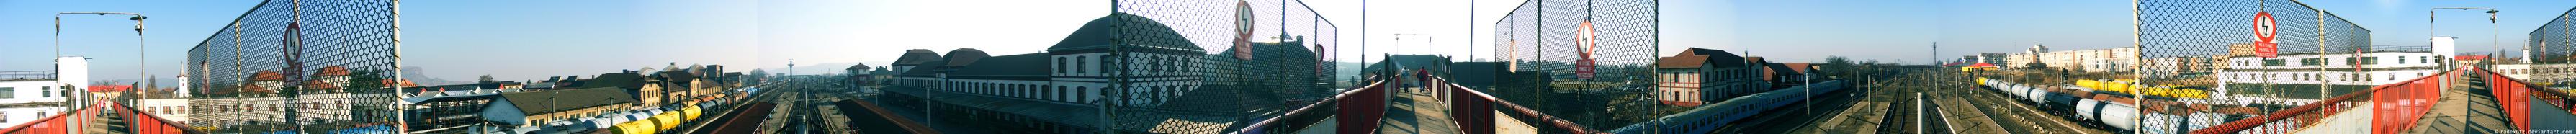 Simeria Train Station Panorama by radexutz